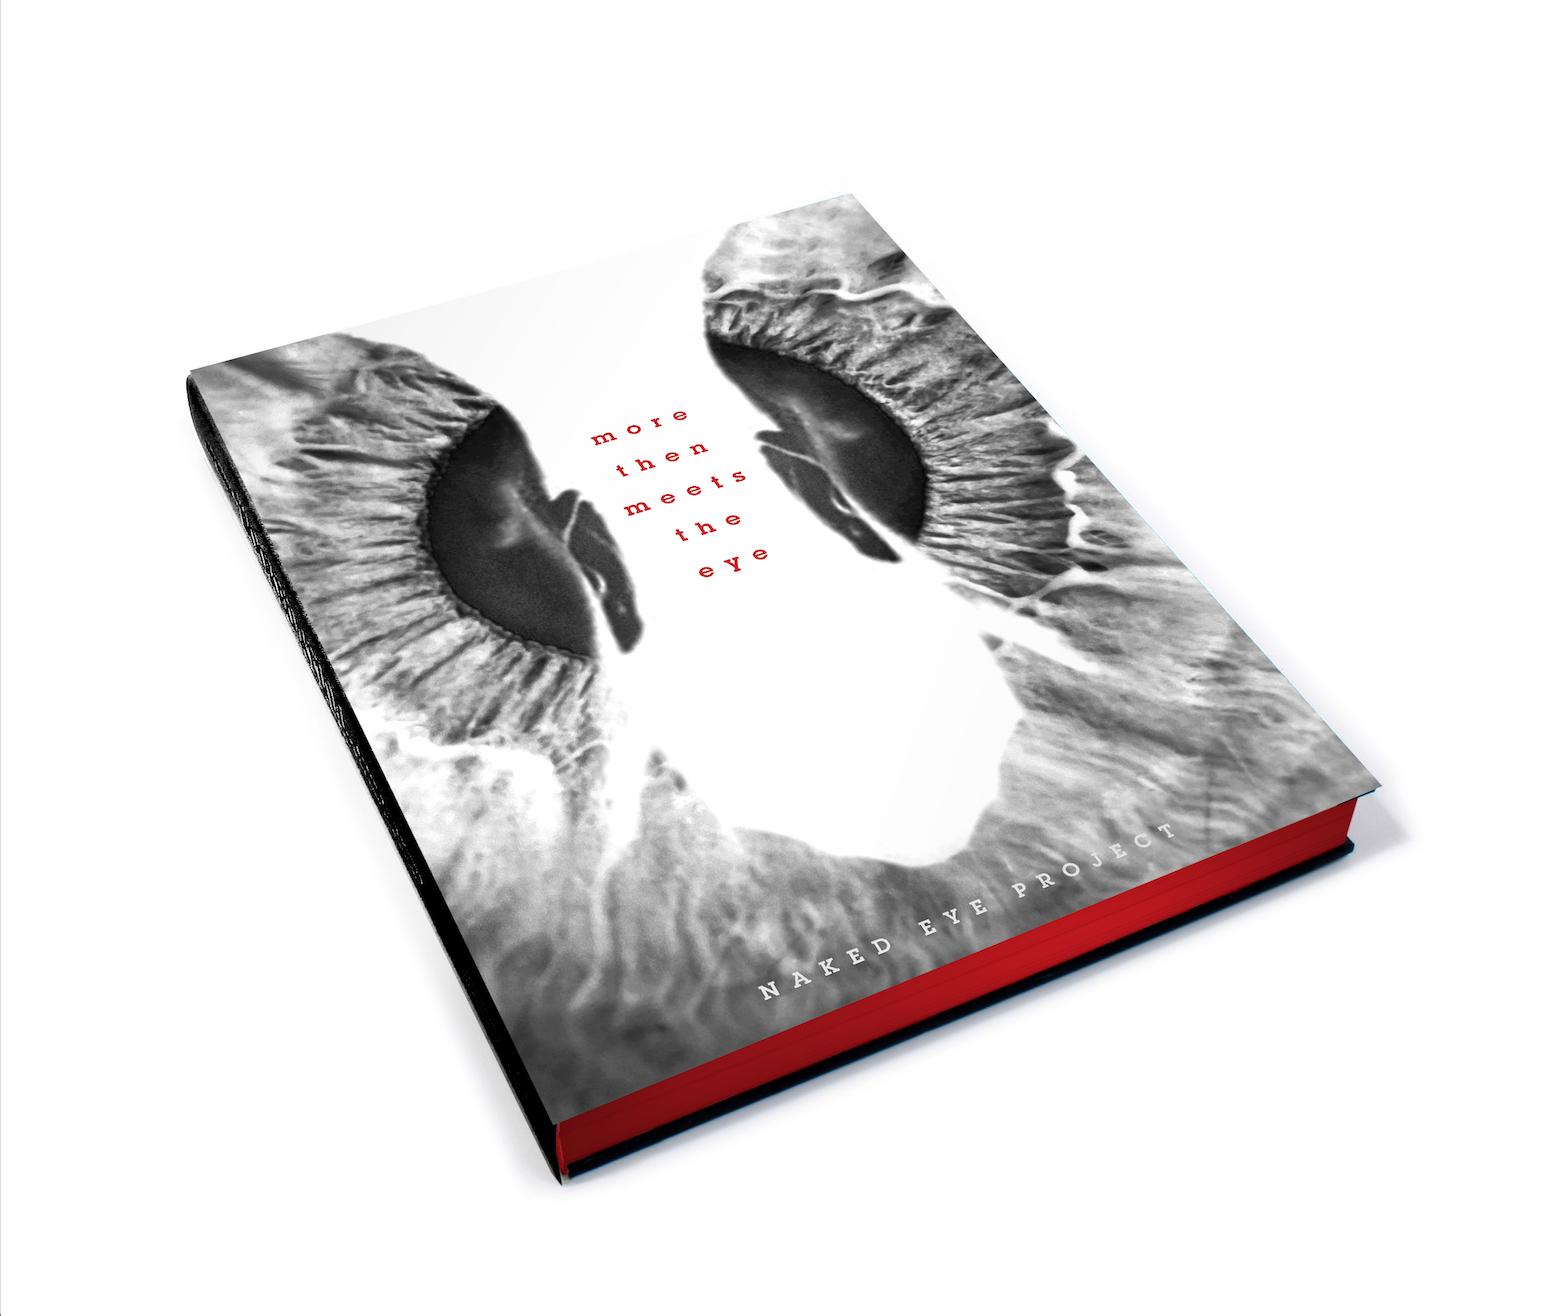 Cover boek jpeg.jpg